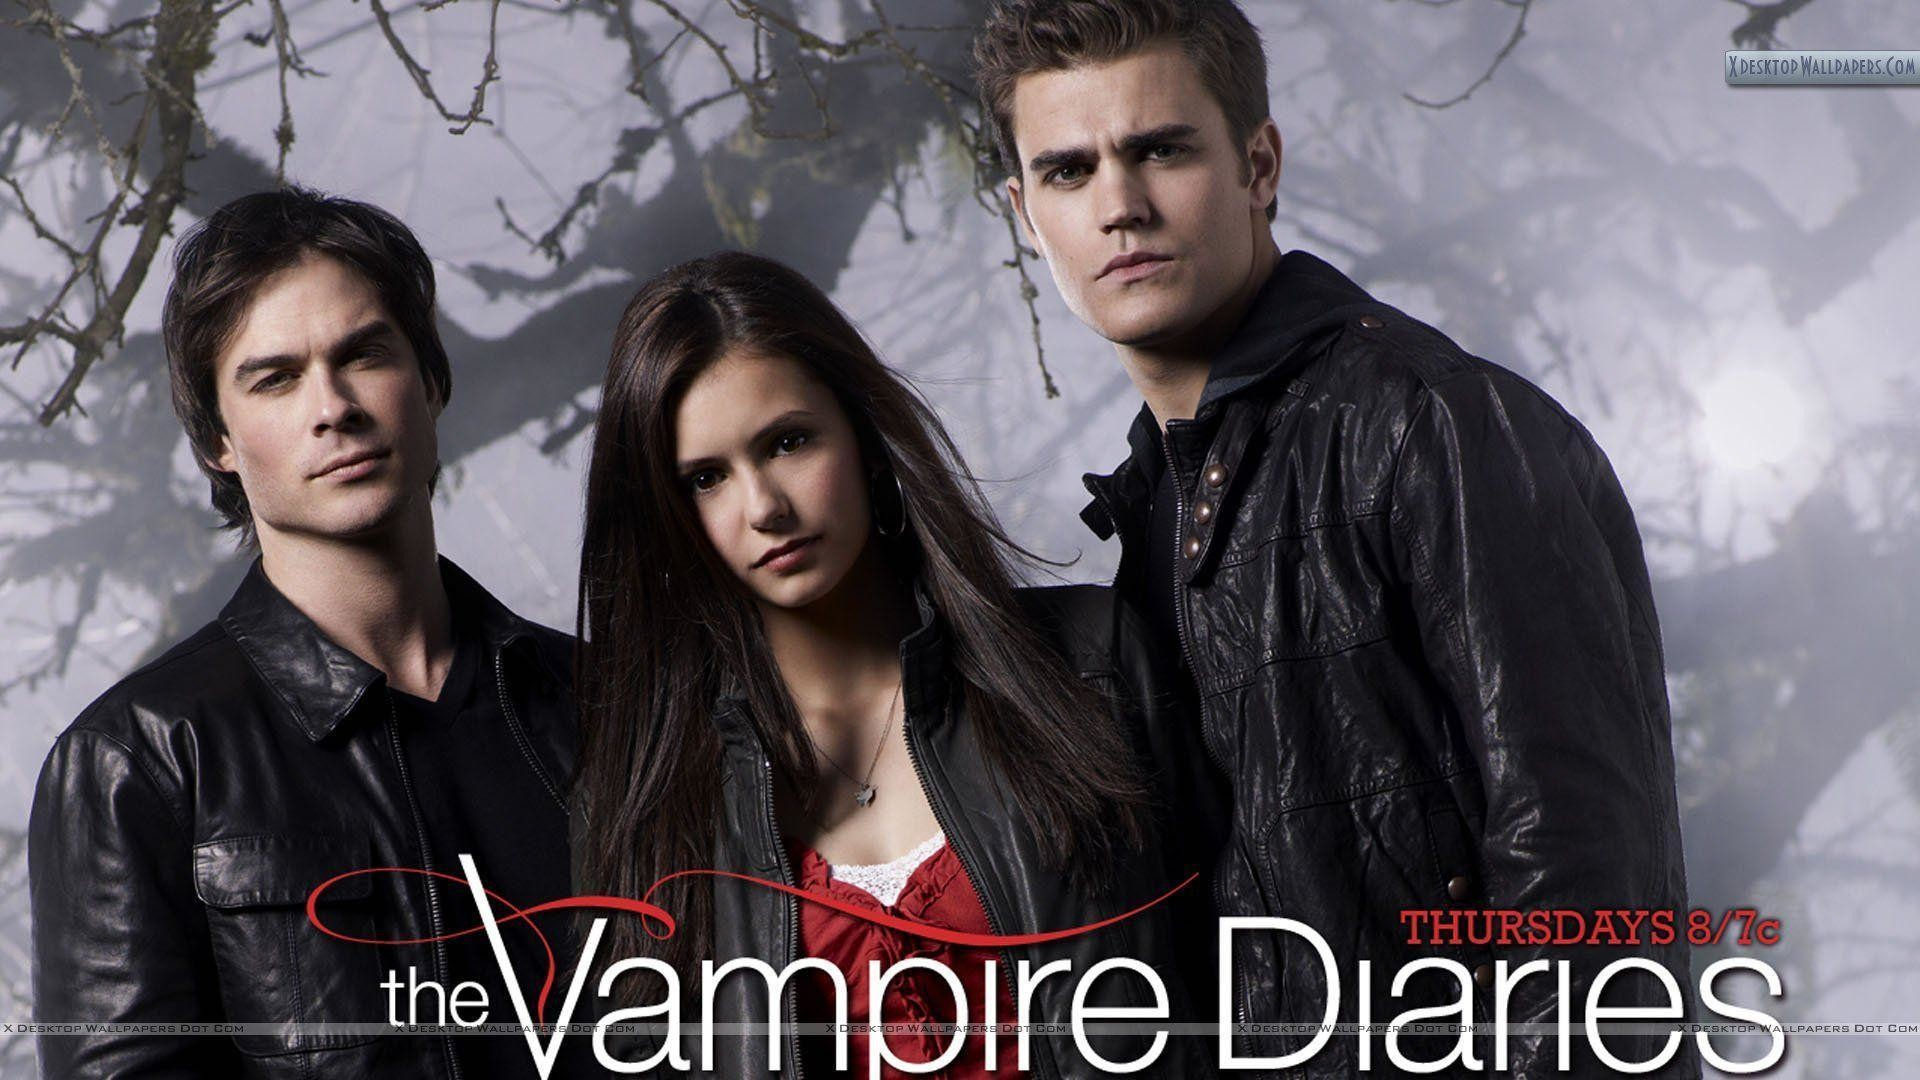 The Vampire Diaries Wallpaper Damon 80 Pictures